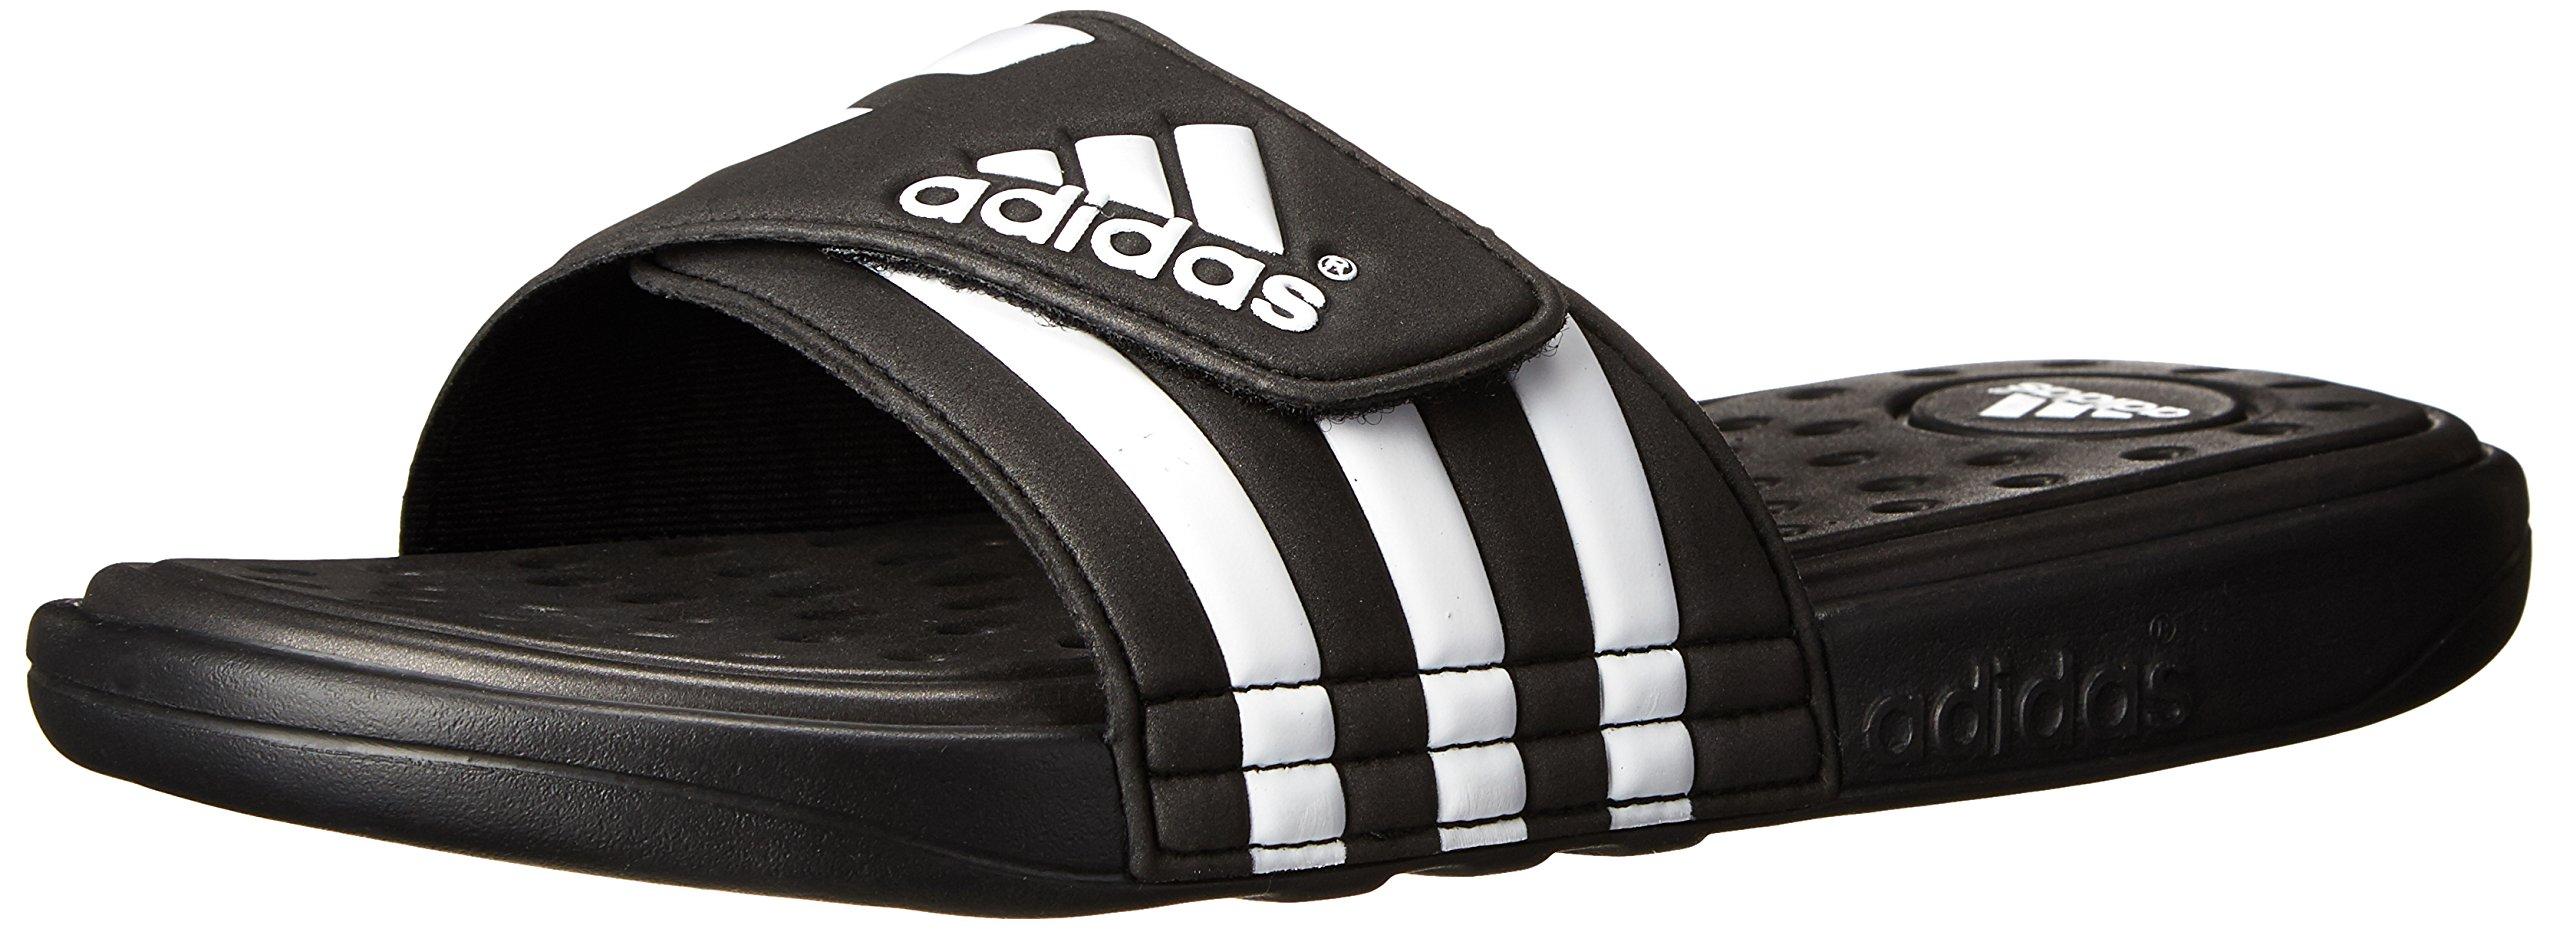 4297c2e9c9b1cc Get Quotations · adidas Men s Adissage SC Slide Sandal